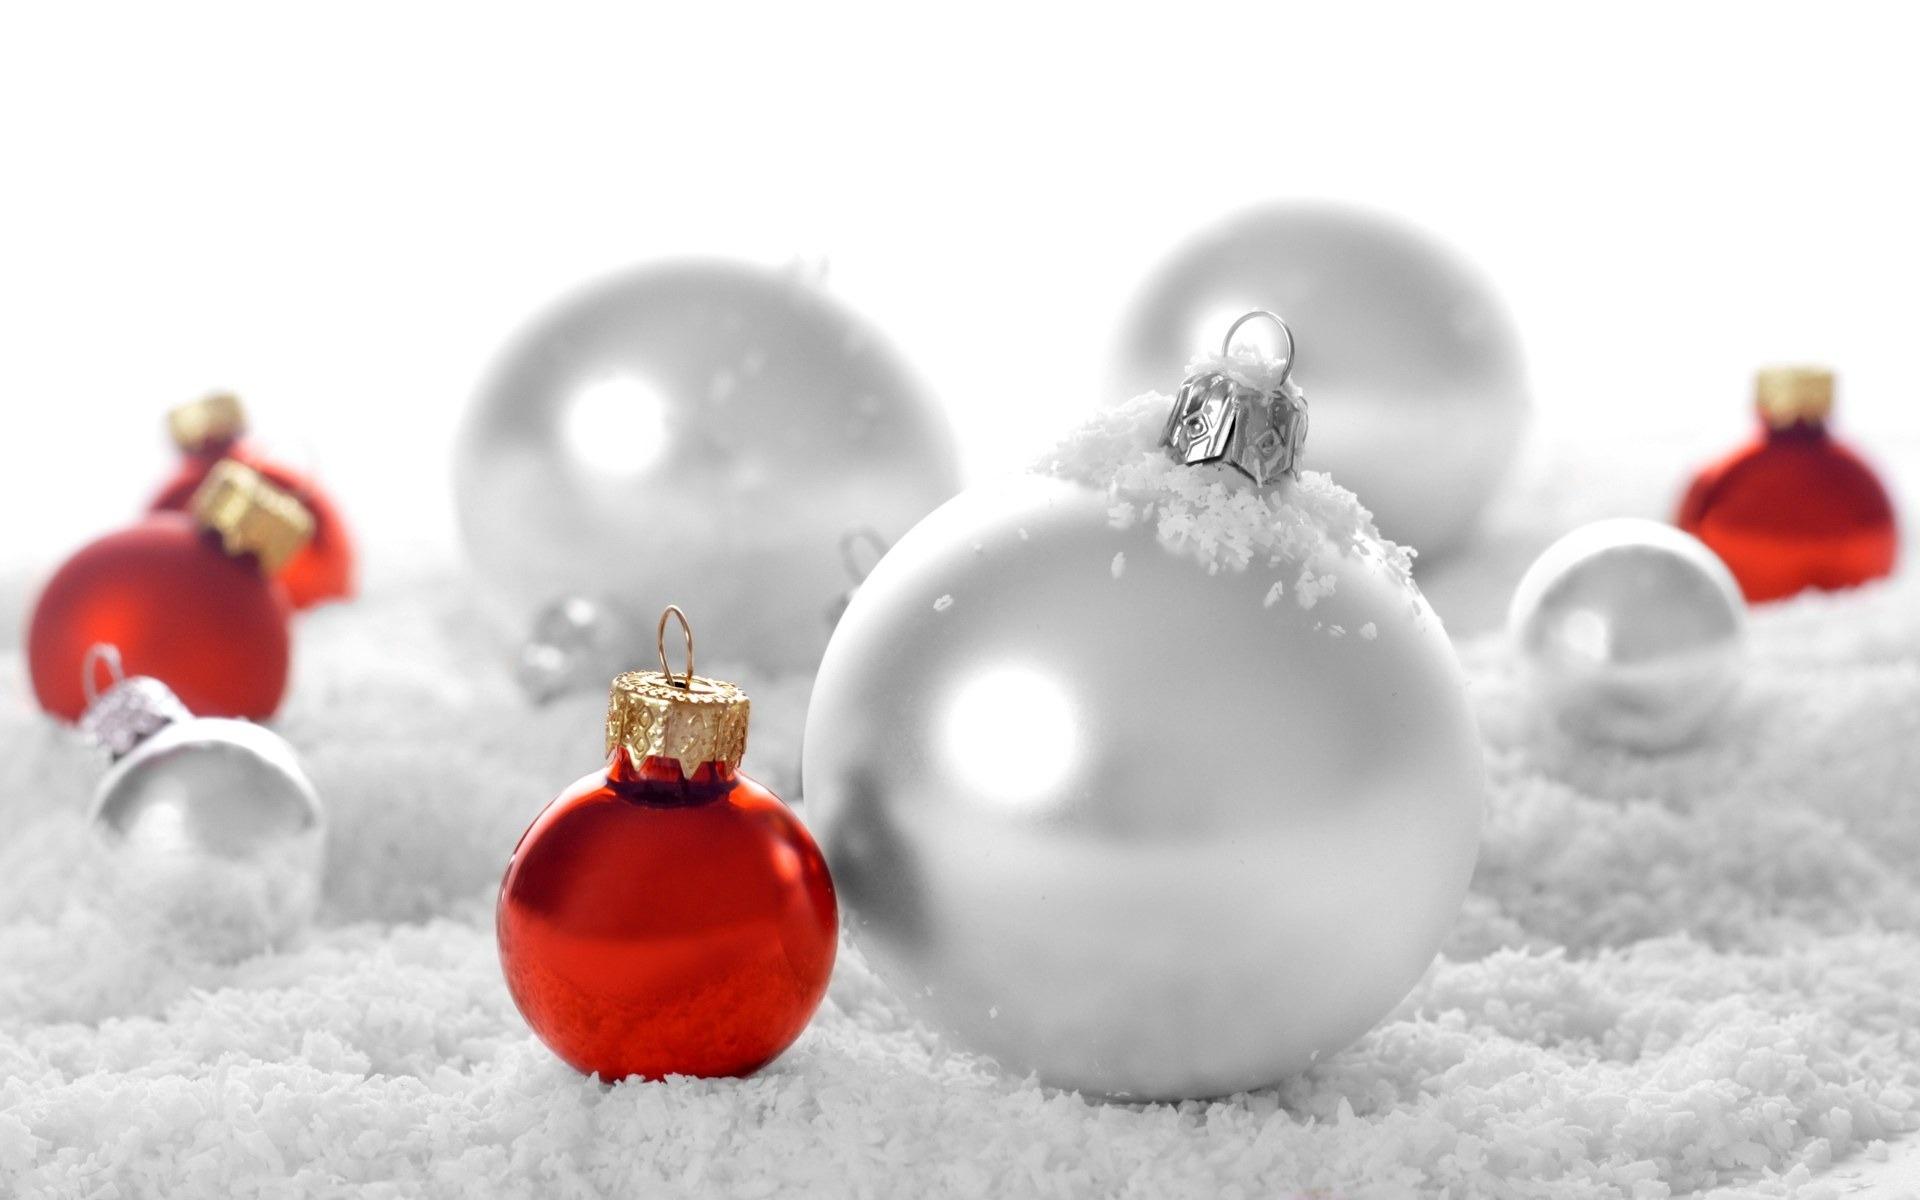 Ornament Christmas 2014 Wallpaper